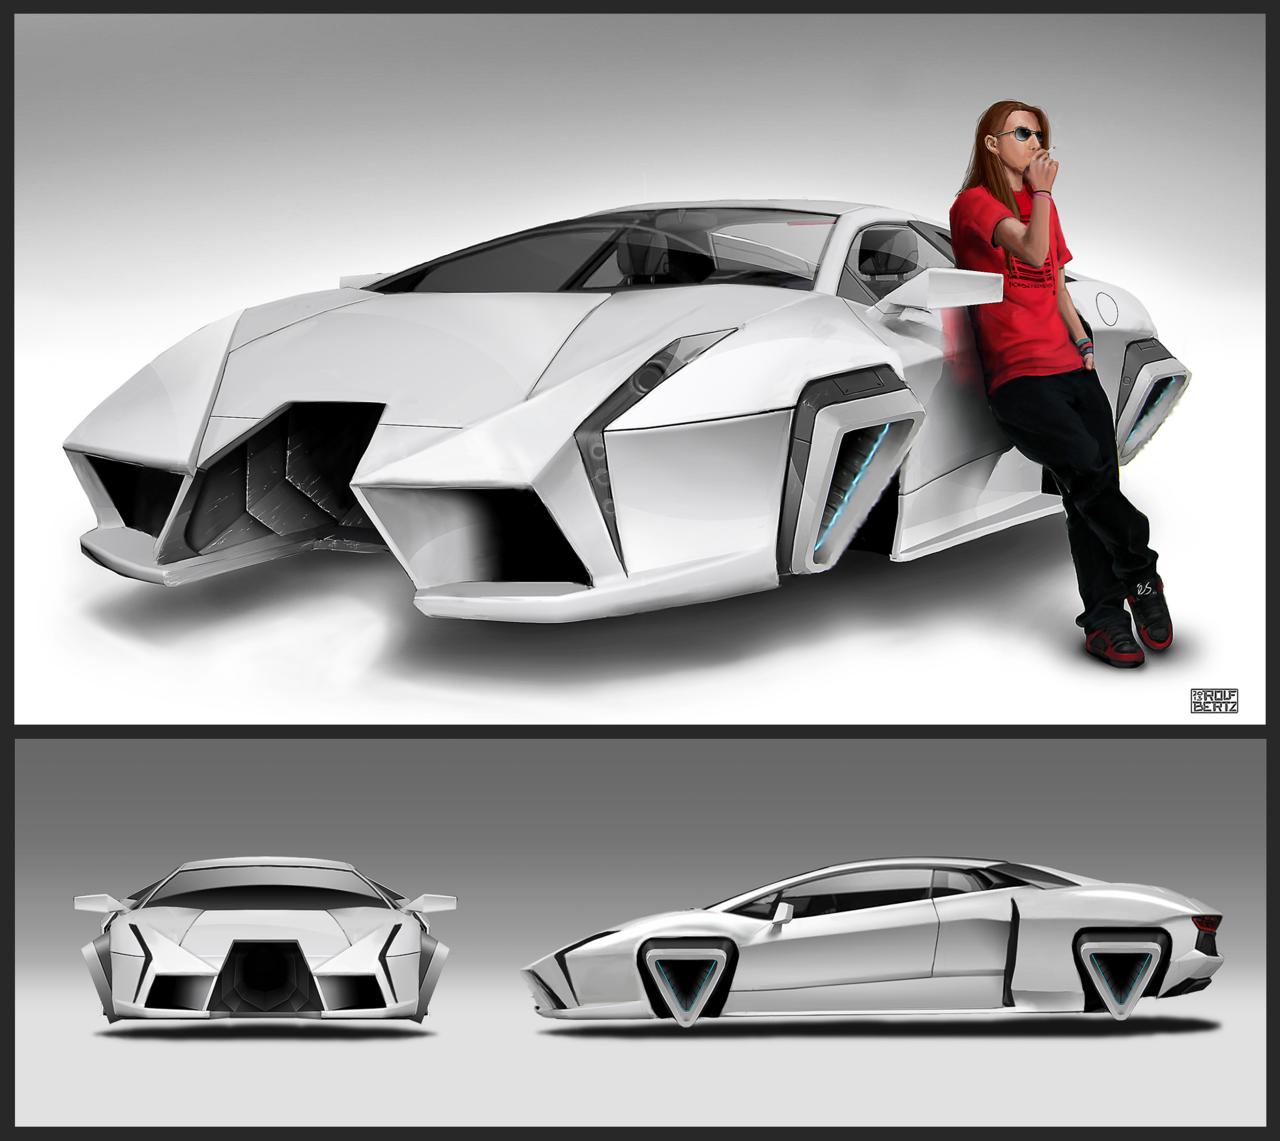 Drawn car future #13